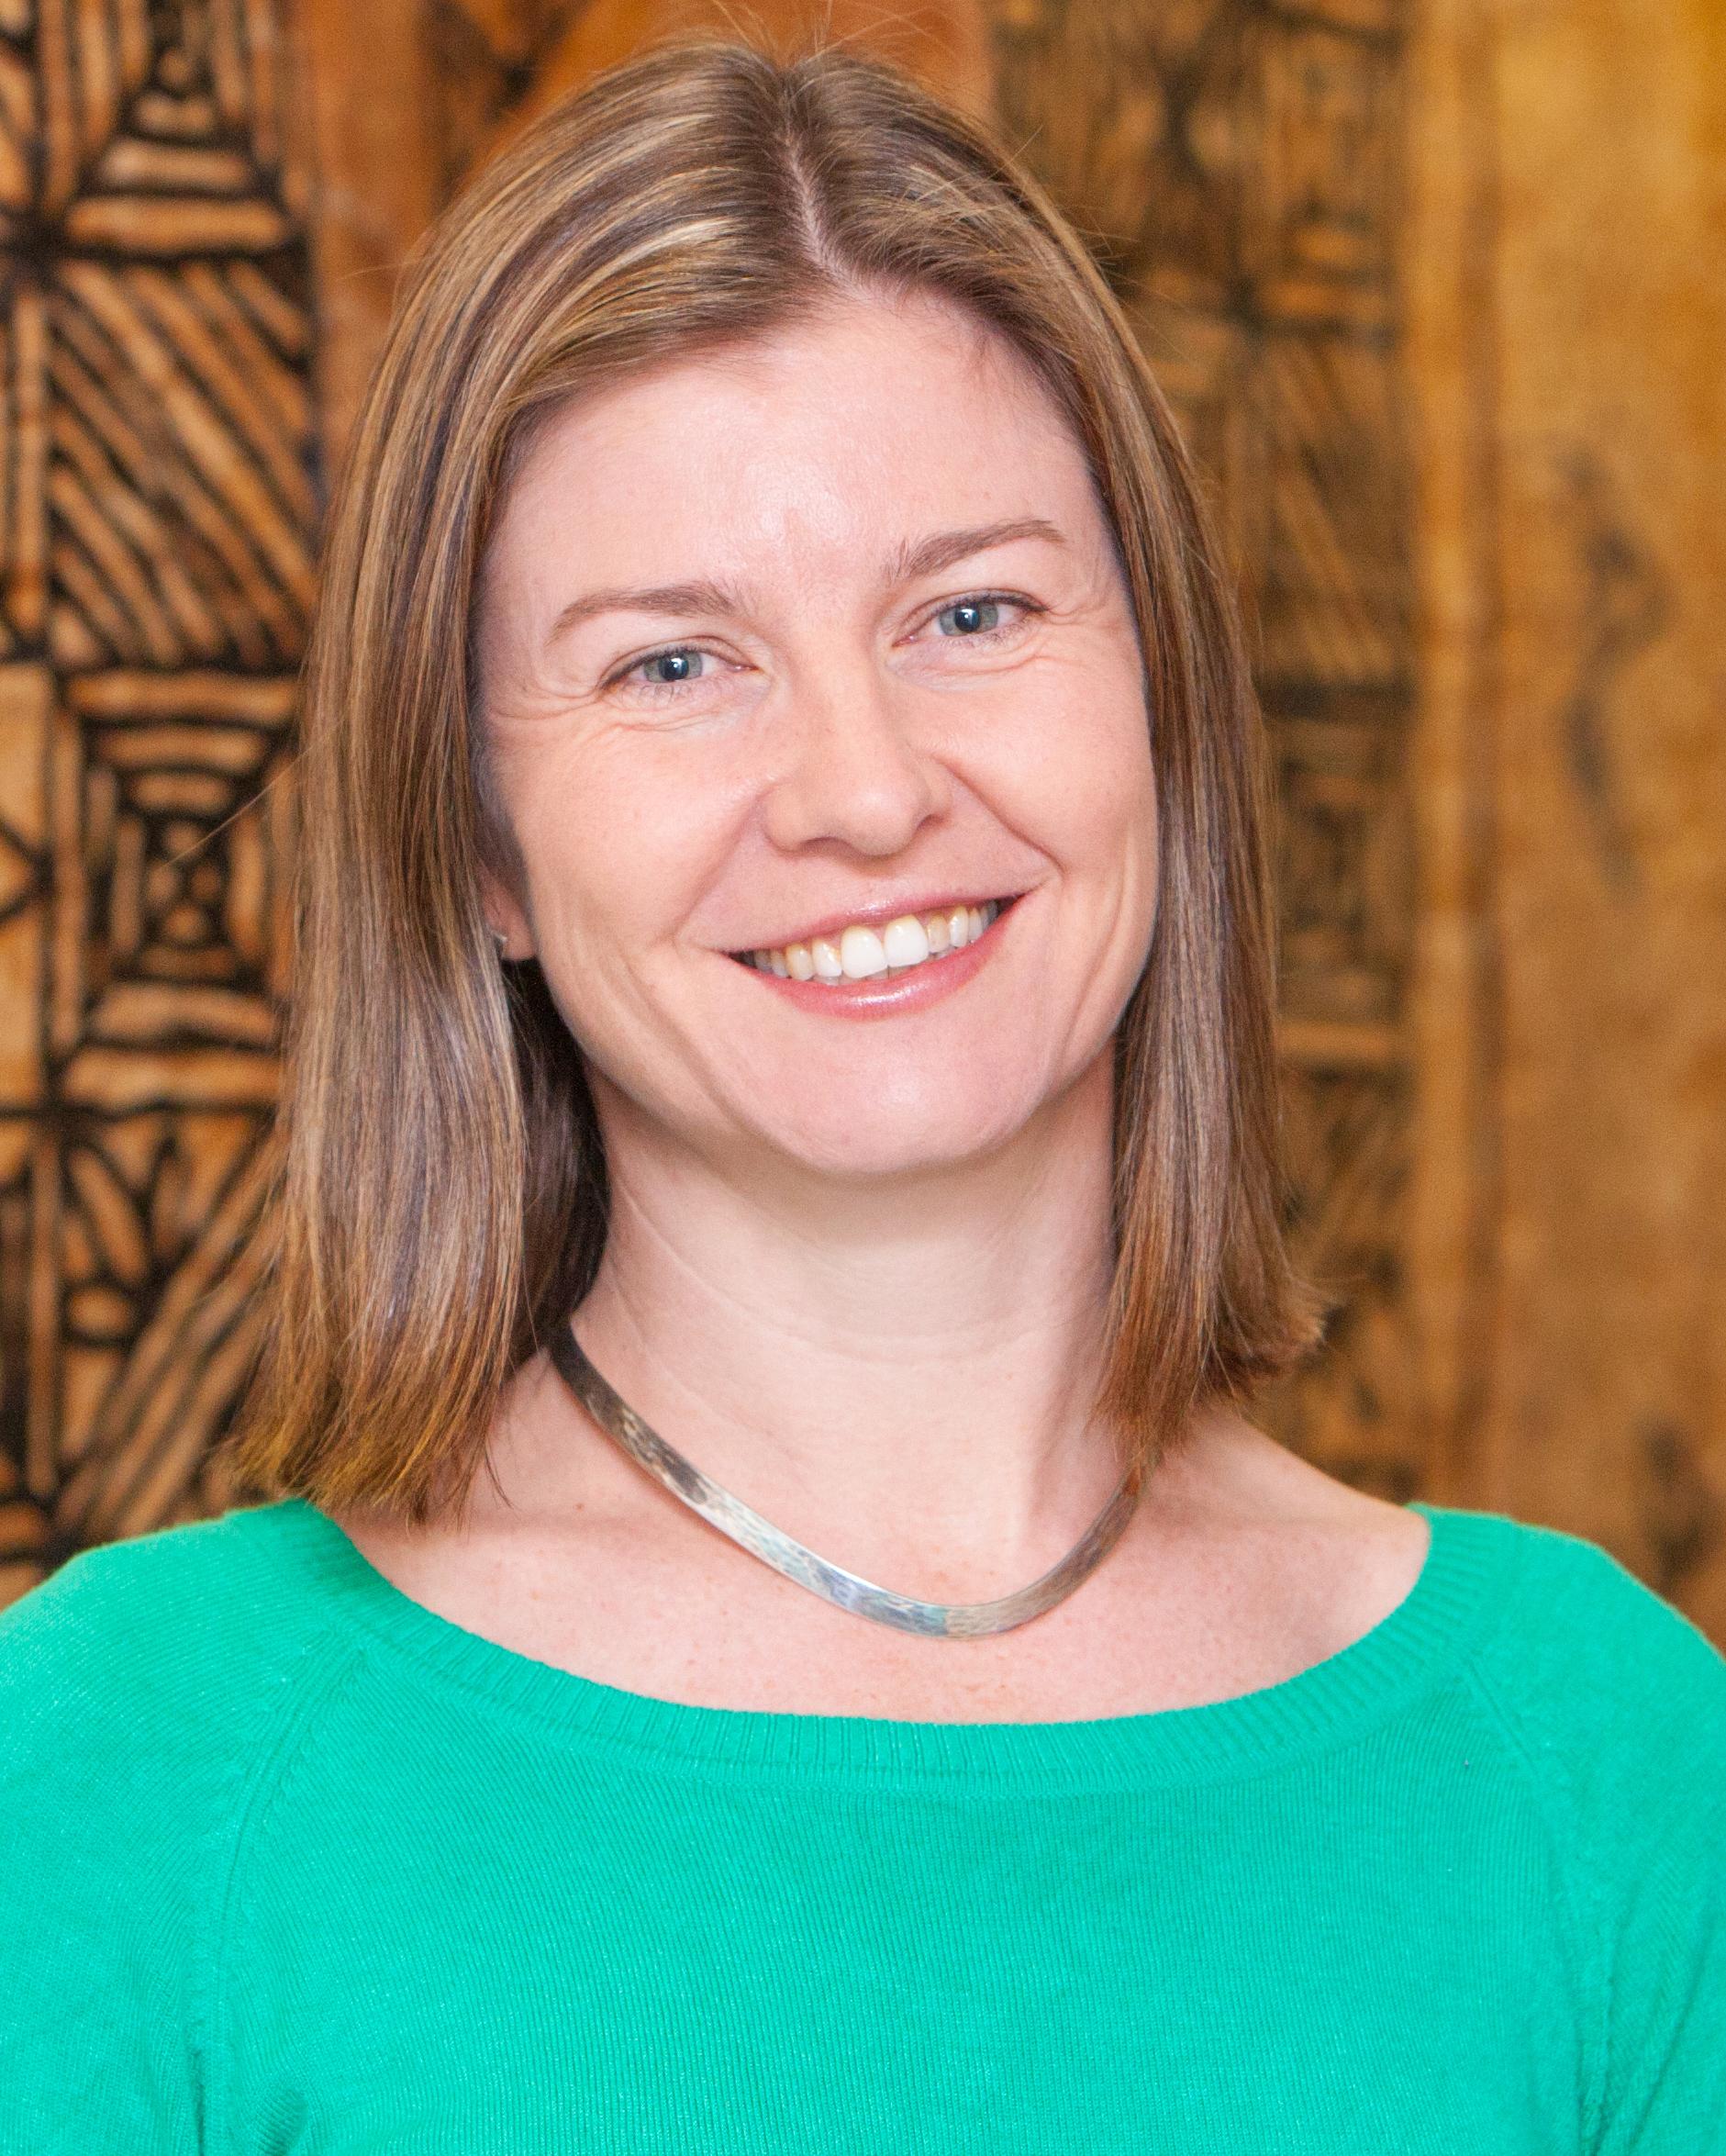 Fulbright Award a lifetime honour for AUT anthropologist